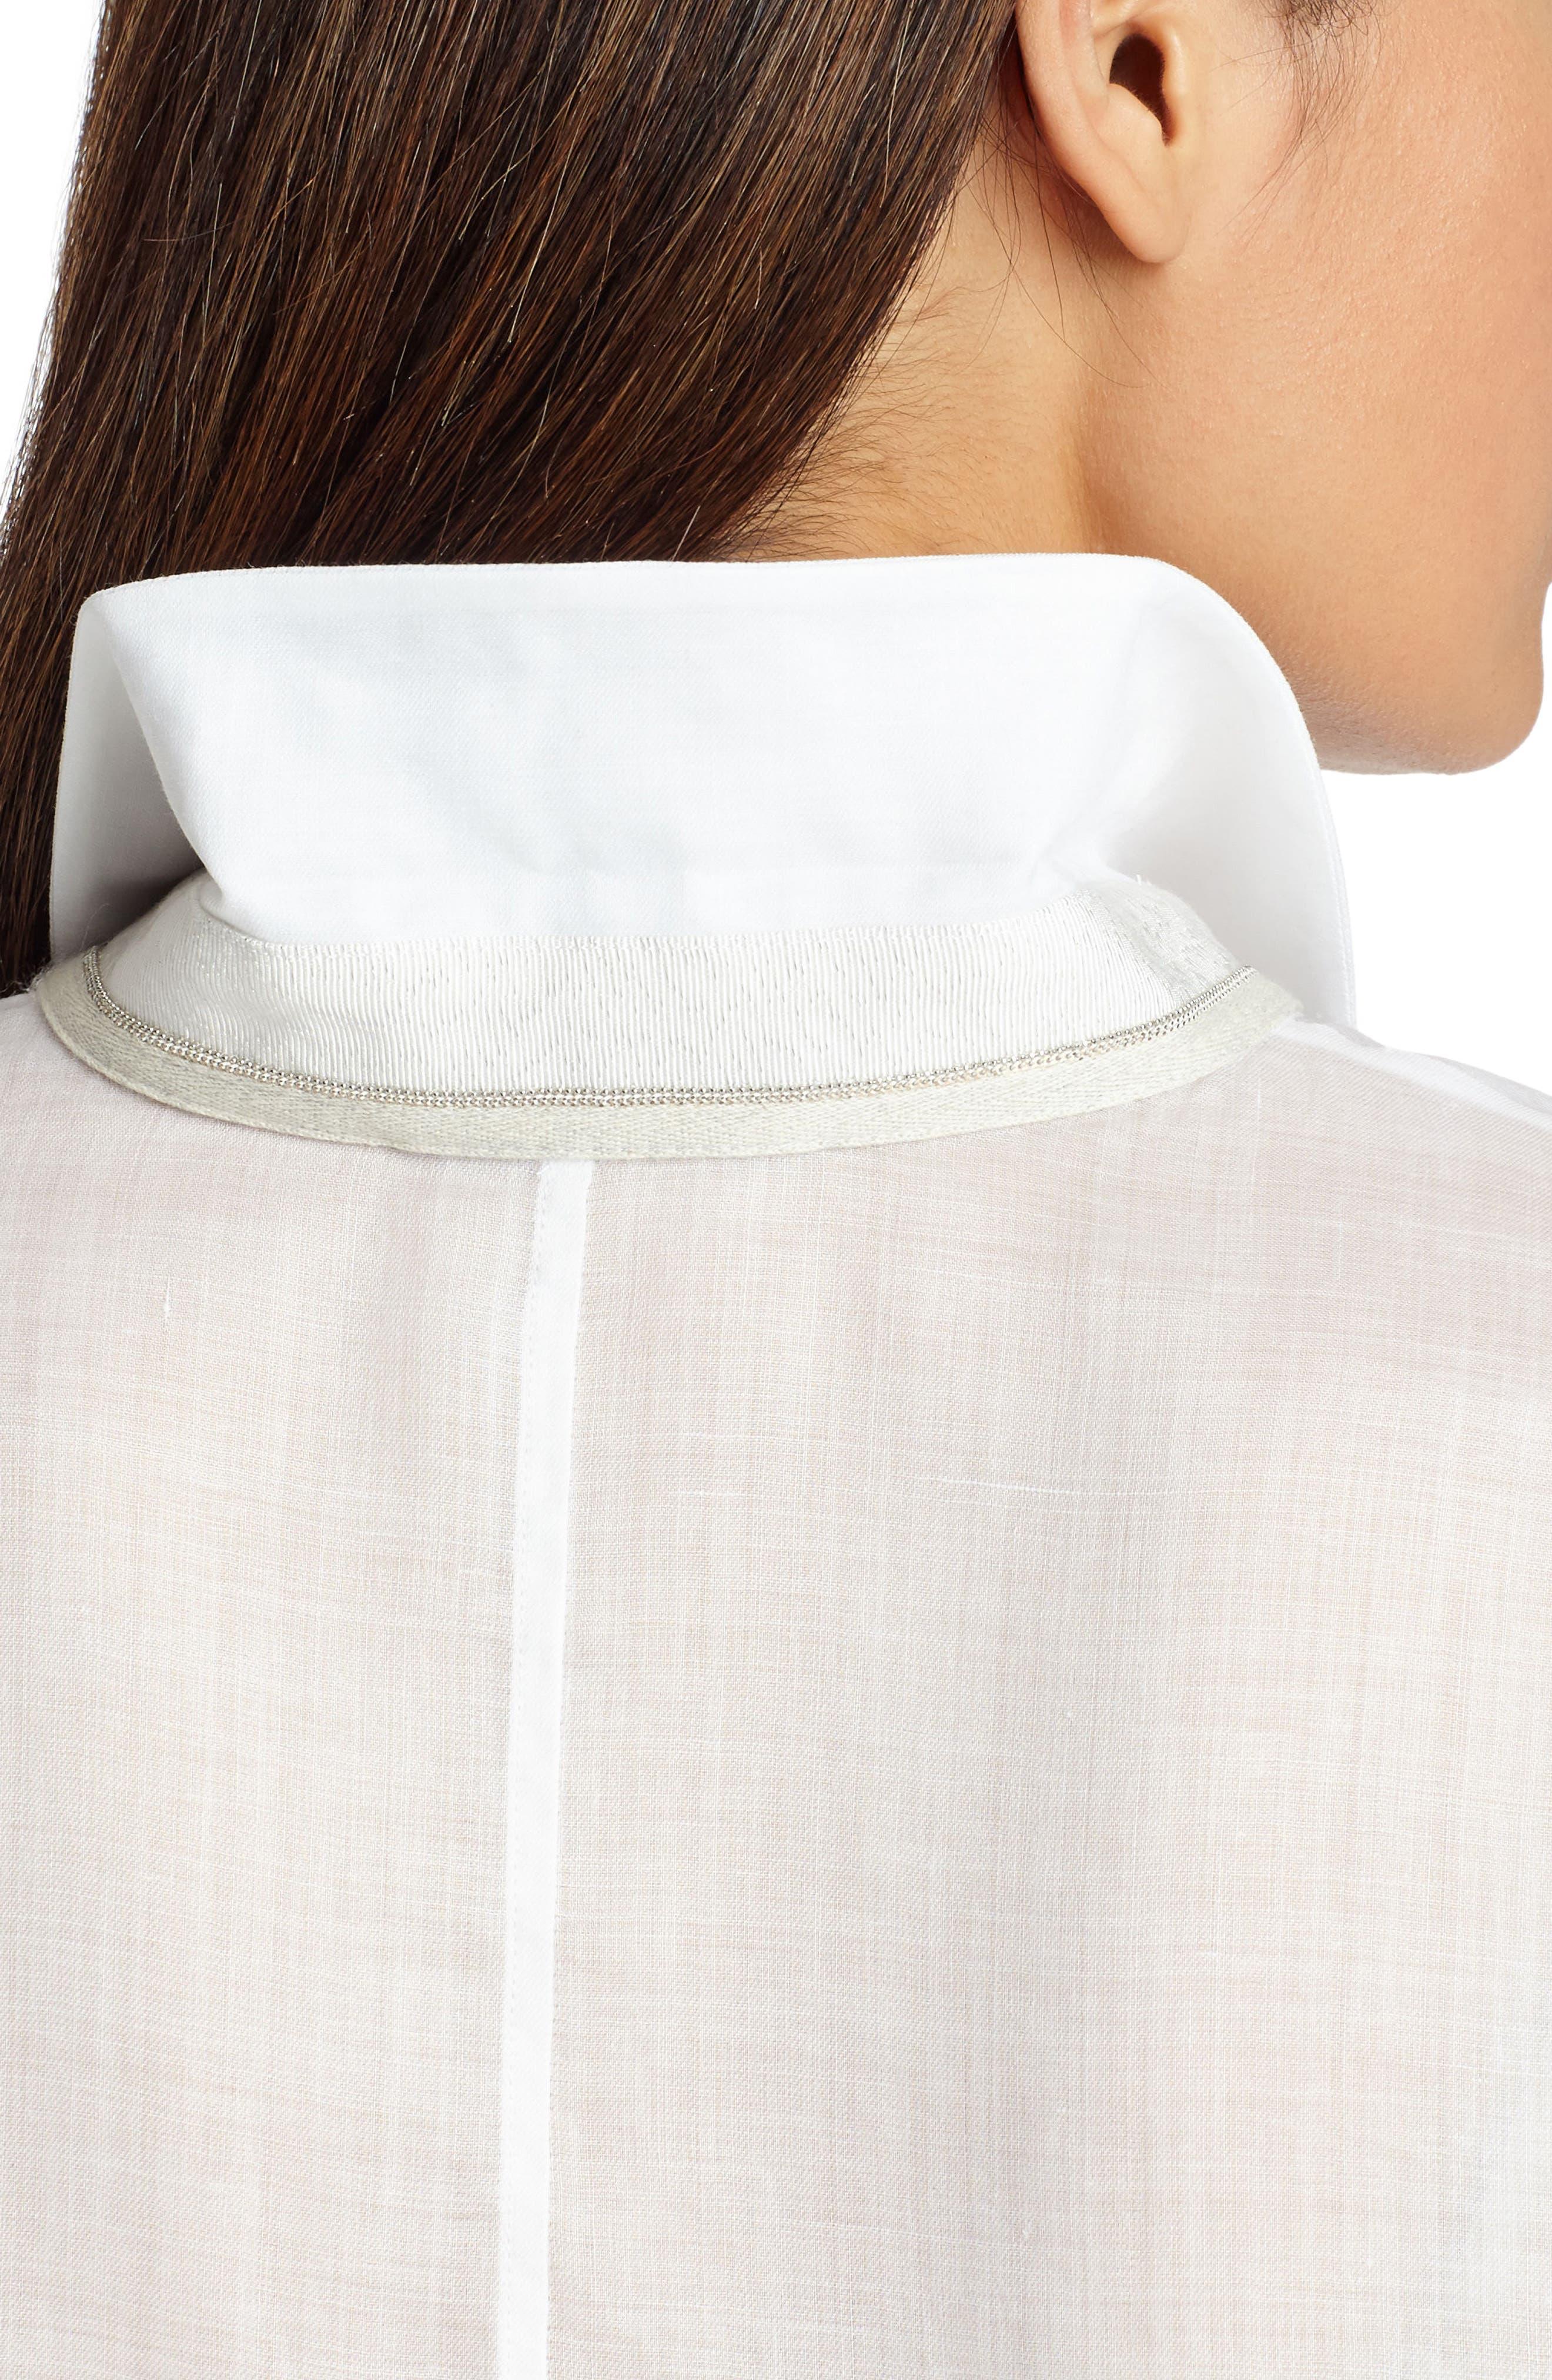 Alyssa Gemma Cloth Blouse,                             Alternate thumbnail 4, color,                             White